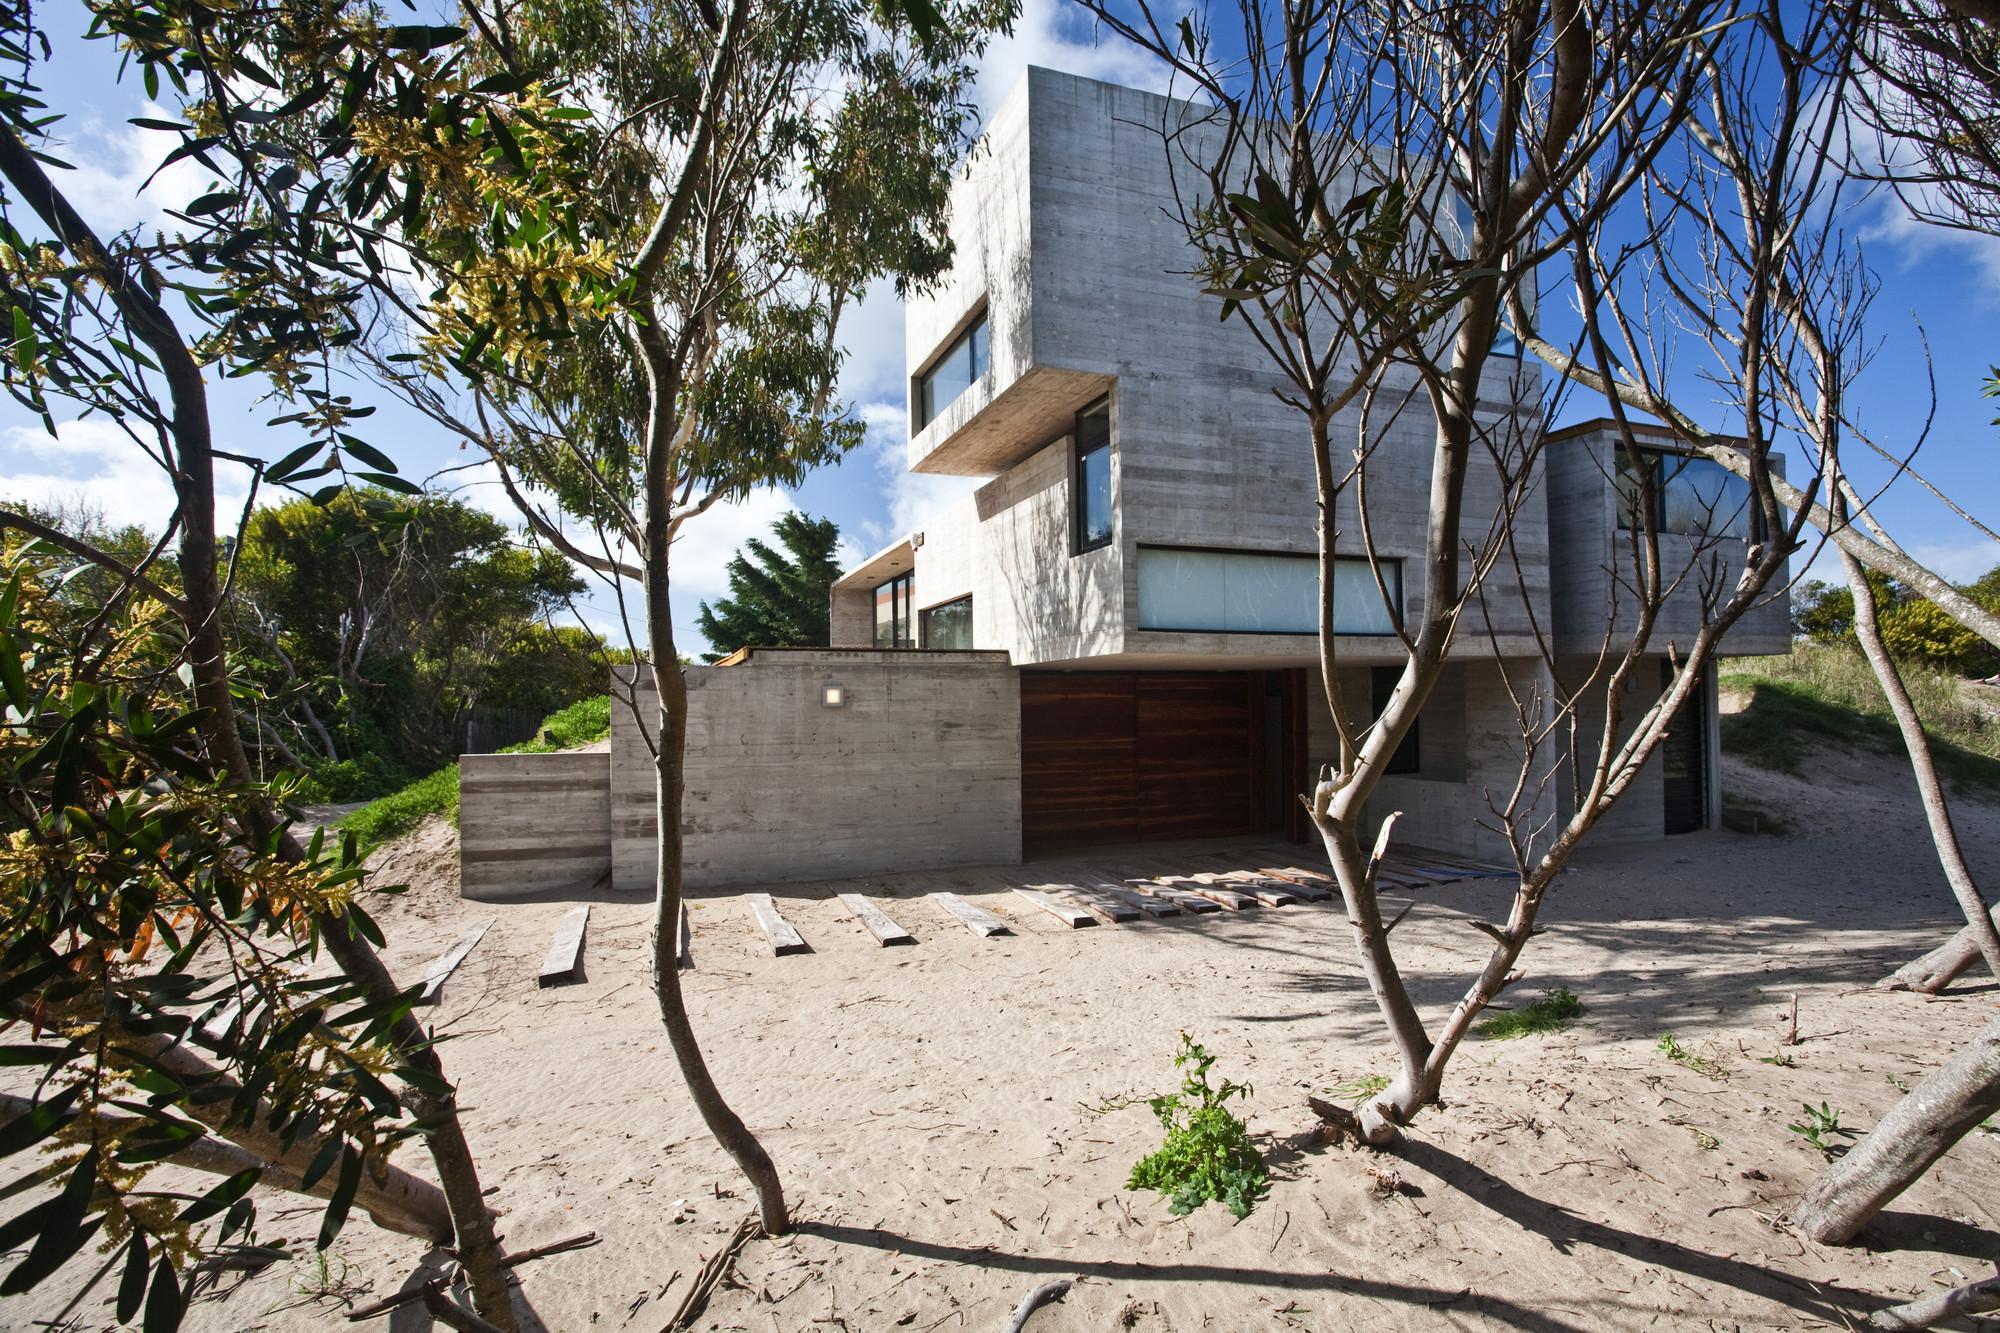 House On The Beach / BAK Architects, © Guillerme Morelli